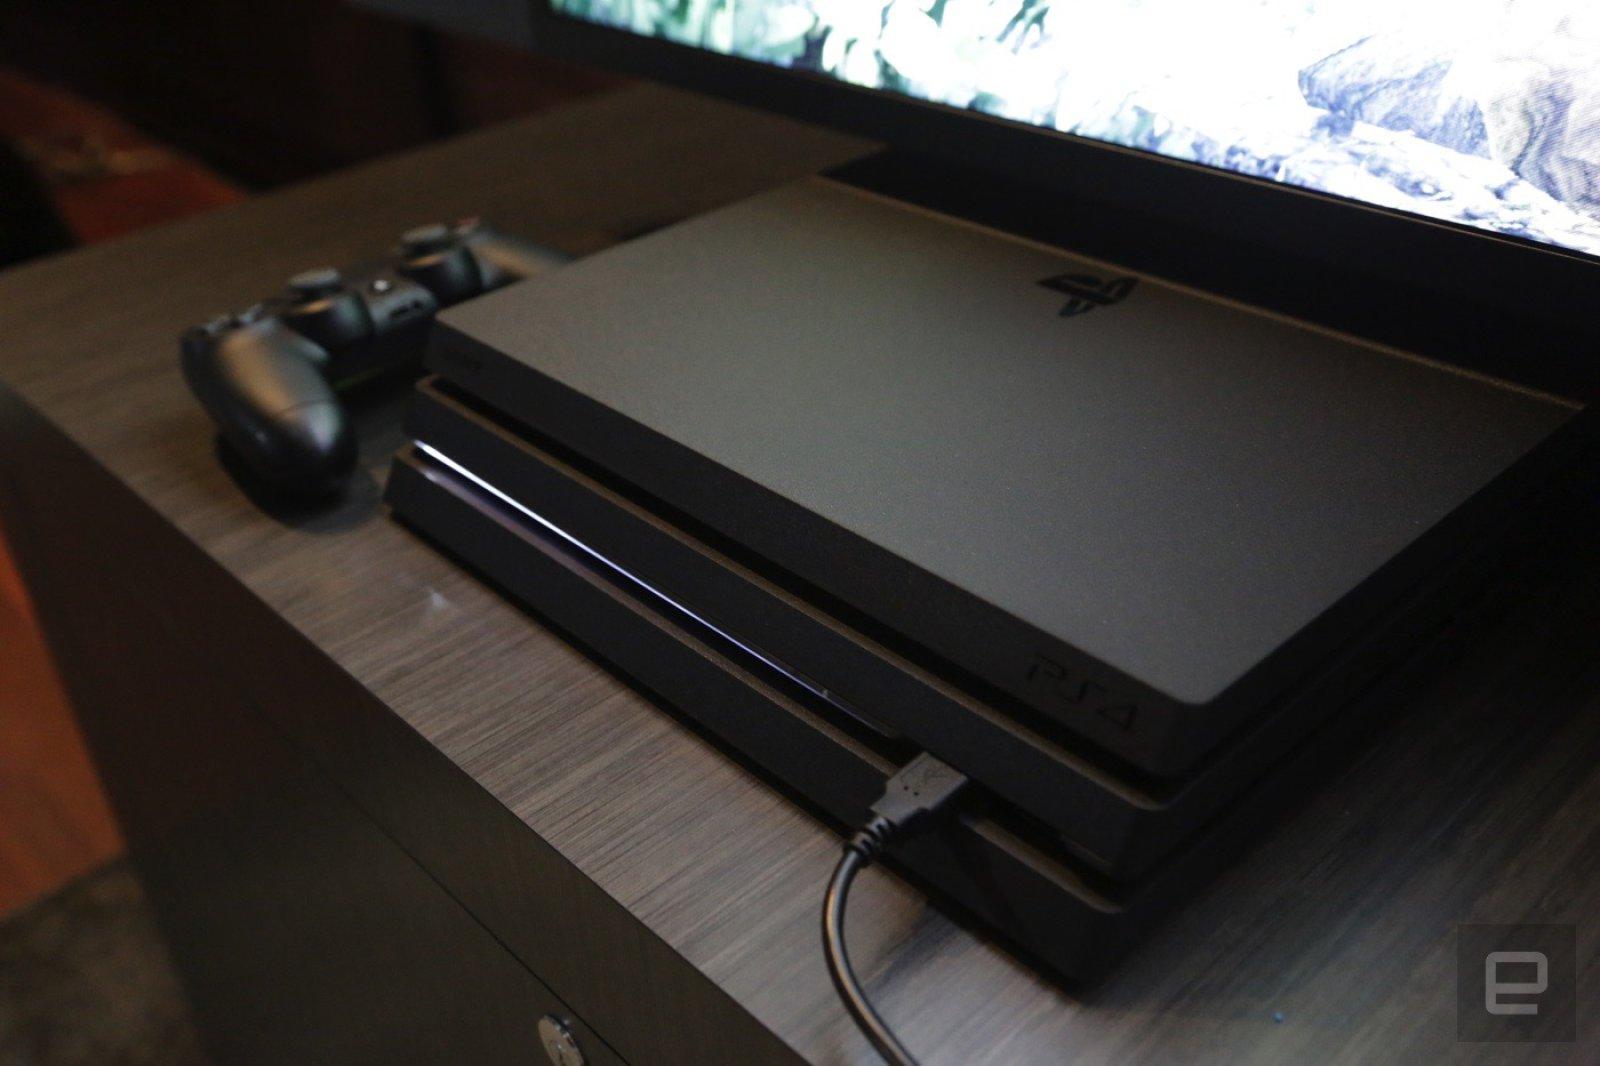 sony playstation 4 pro. sony playstation 4 pro o